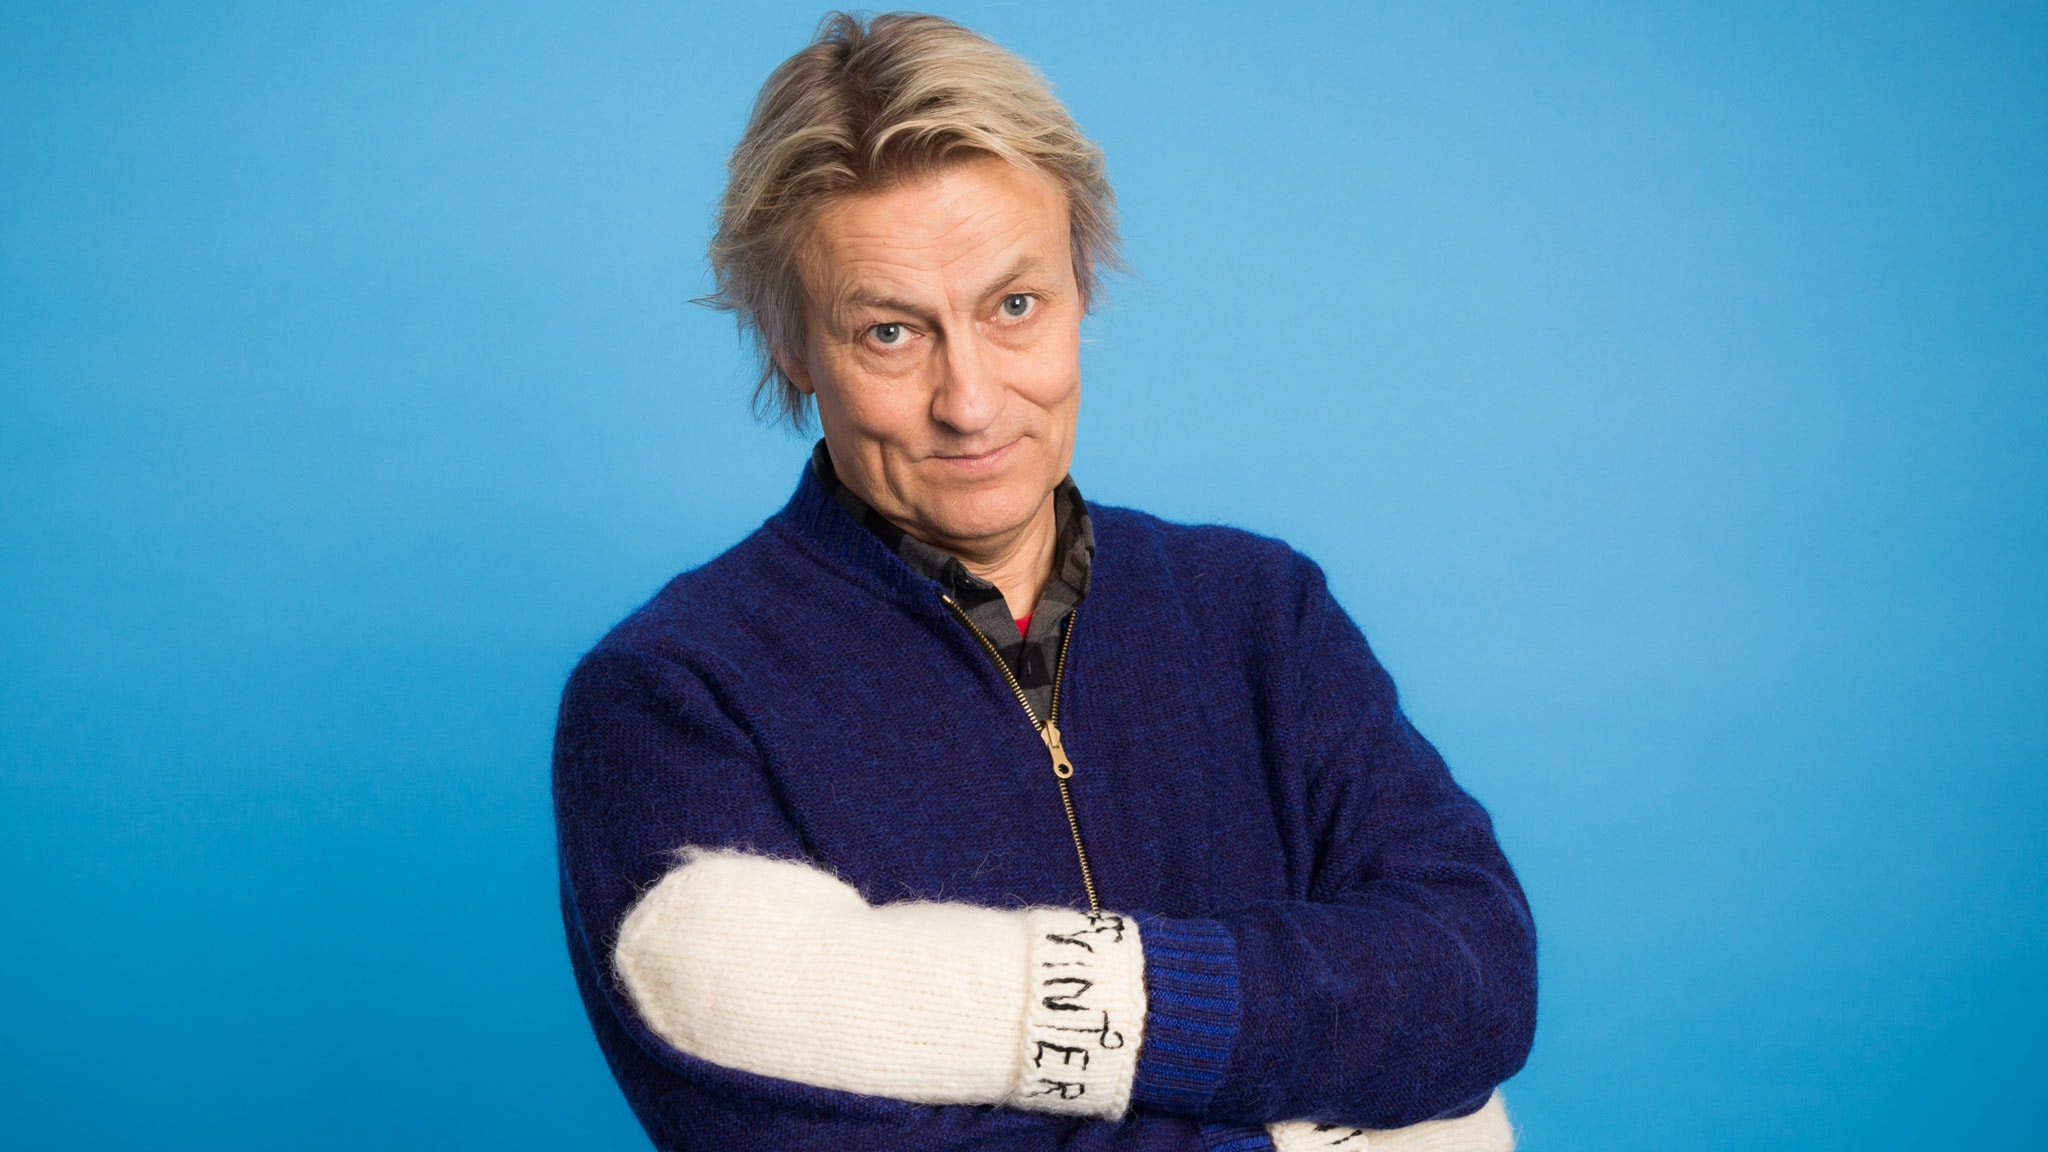 Lars Lerin - Vinter 2014. Foto: Mattias Ahlm/Sveriges Radio